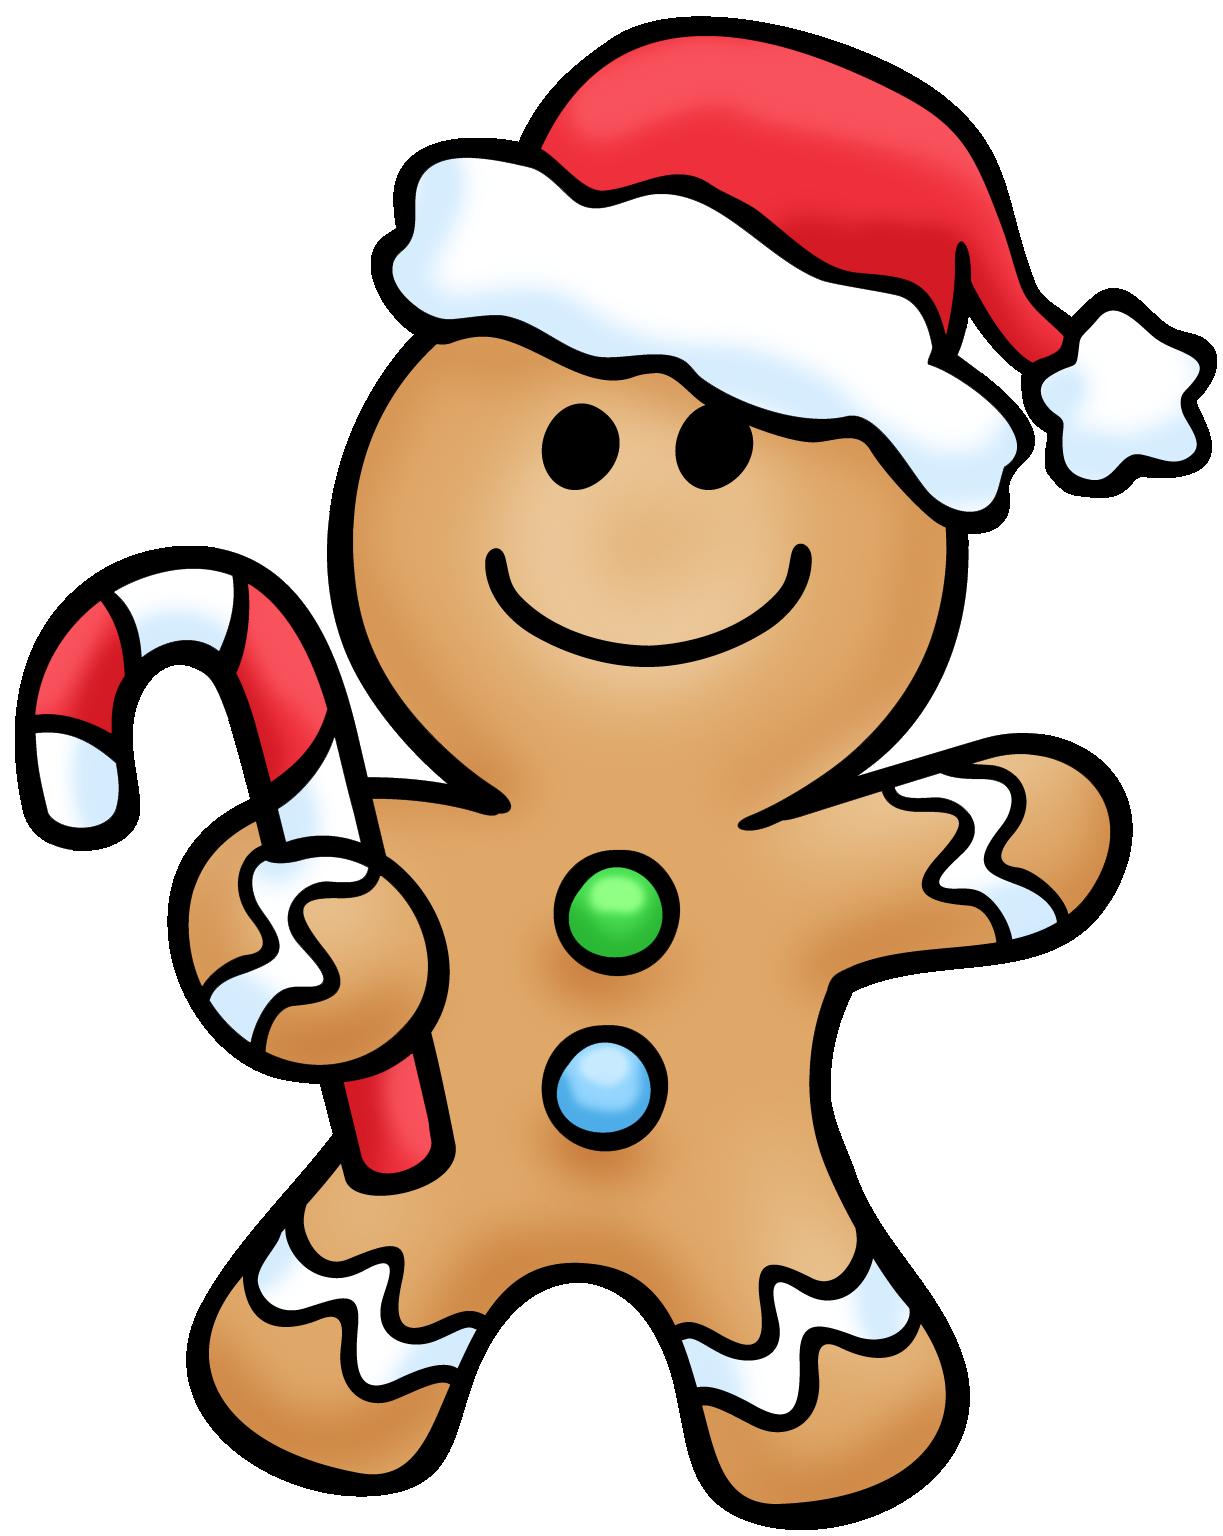 1223x1536 Gingerbread Man Clip Art Images Illustrations Photos